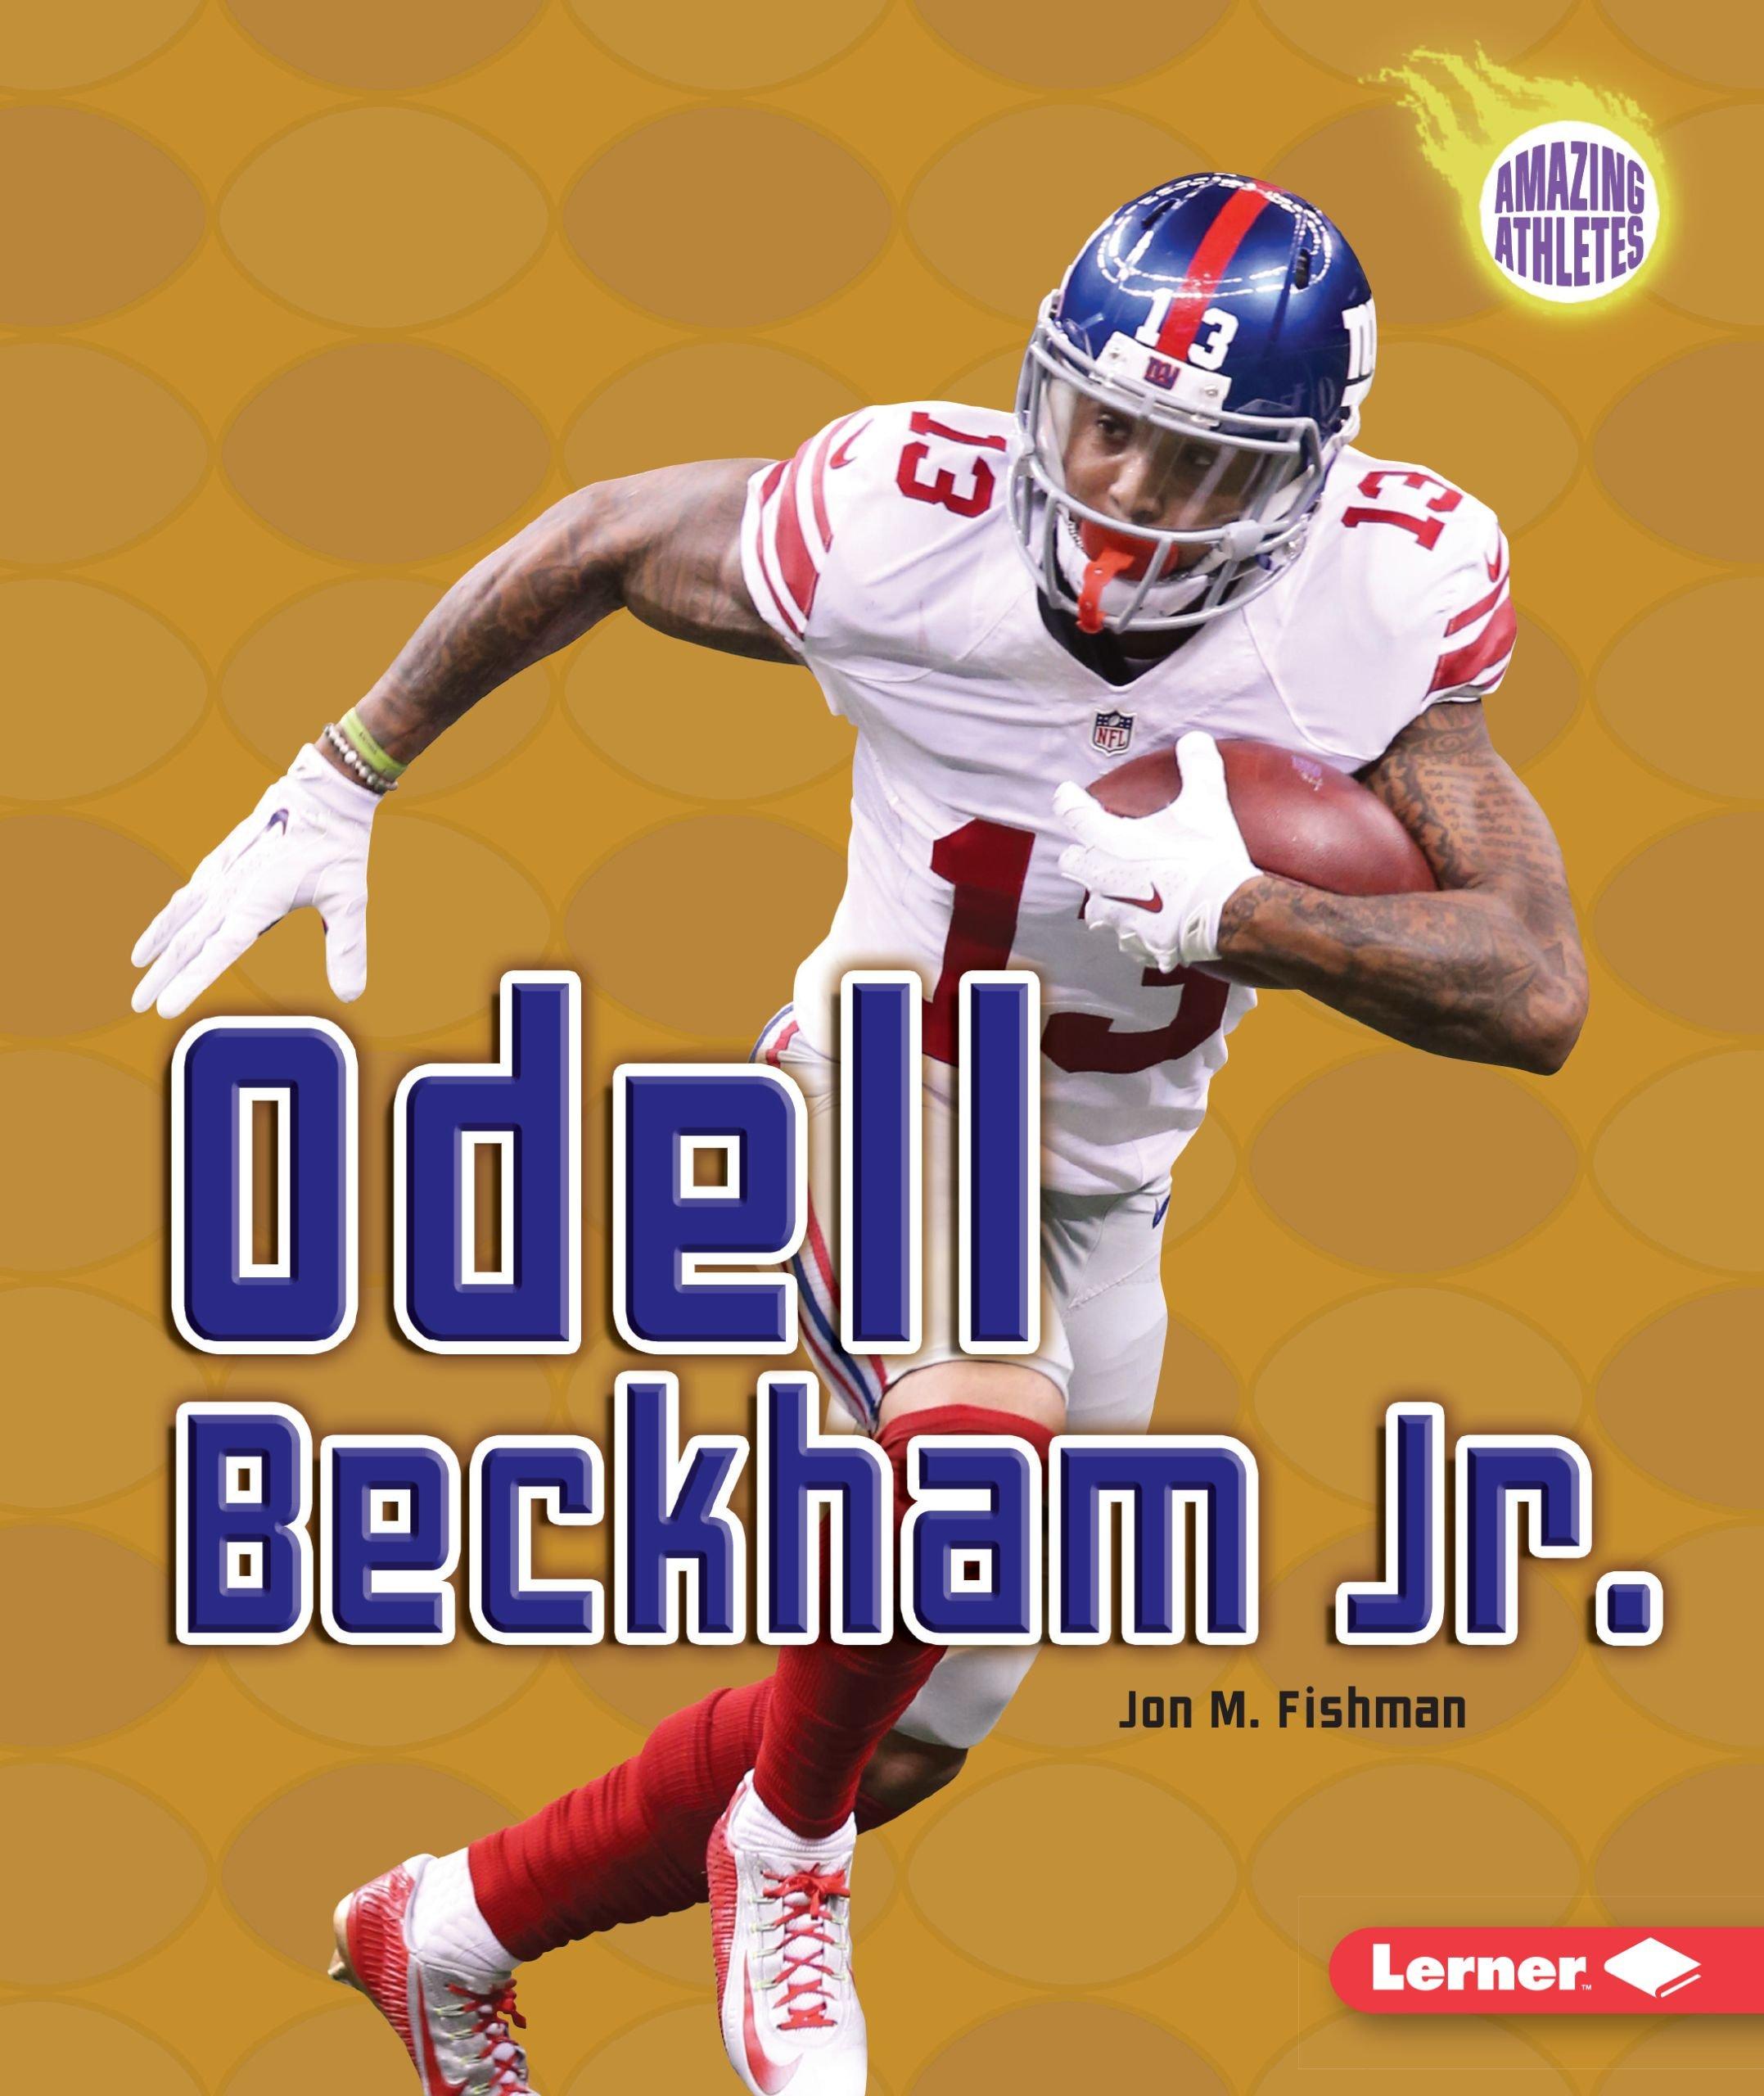 729de1cae2ab6 Odell Beckham Jr. (Amazing Athletes): Jon M. Fishman: 9781512413656 ...